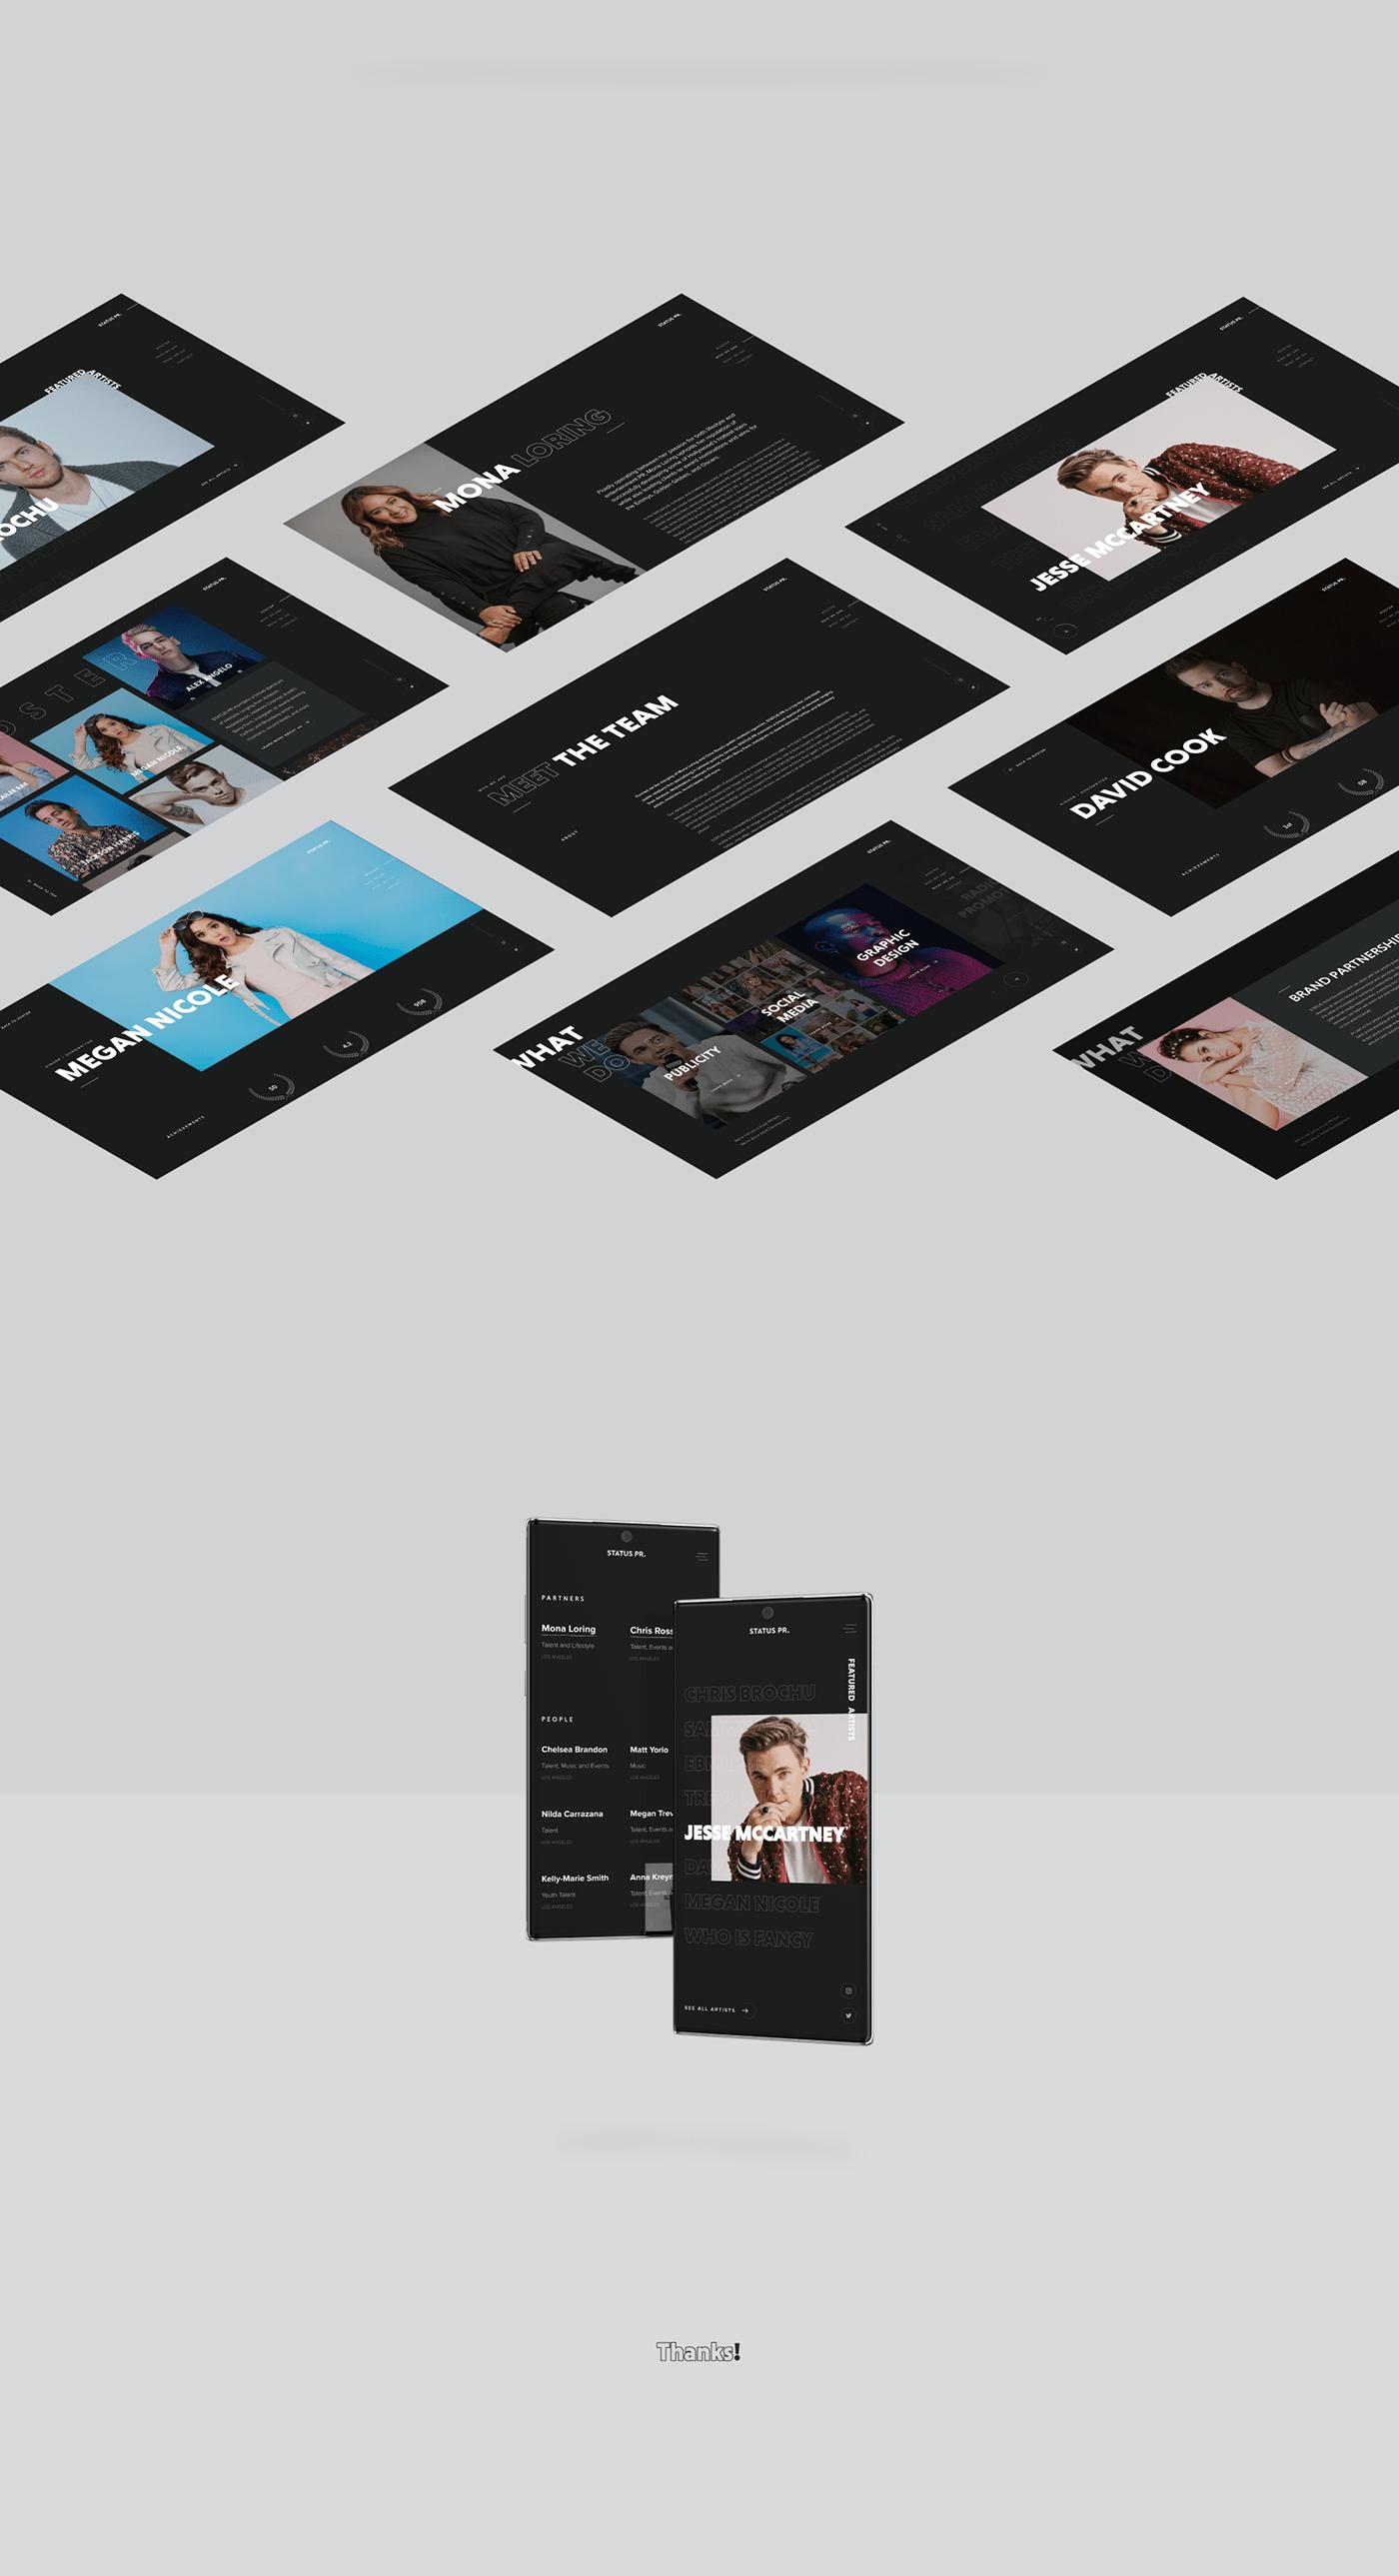 pr music artist Web Design  creative ostellar Interaction design  firm publicity Entertainment